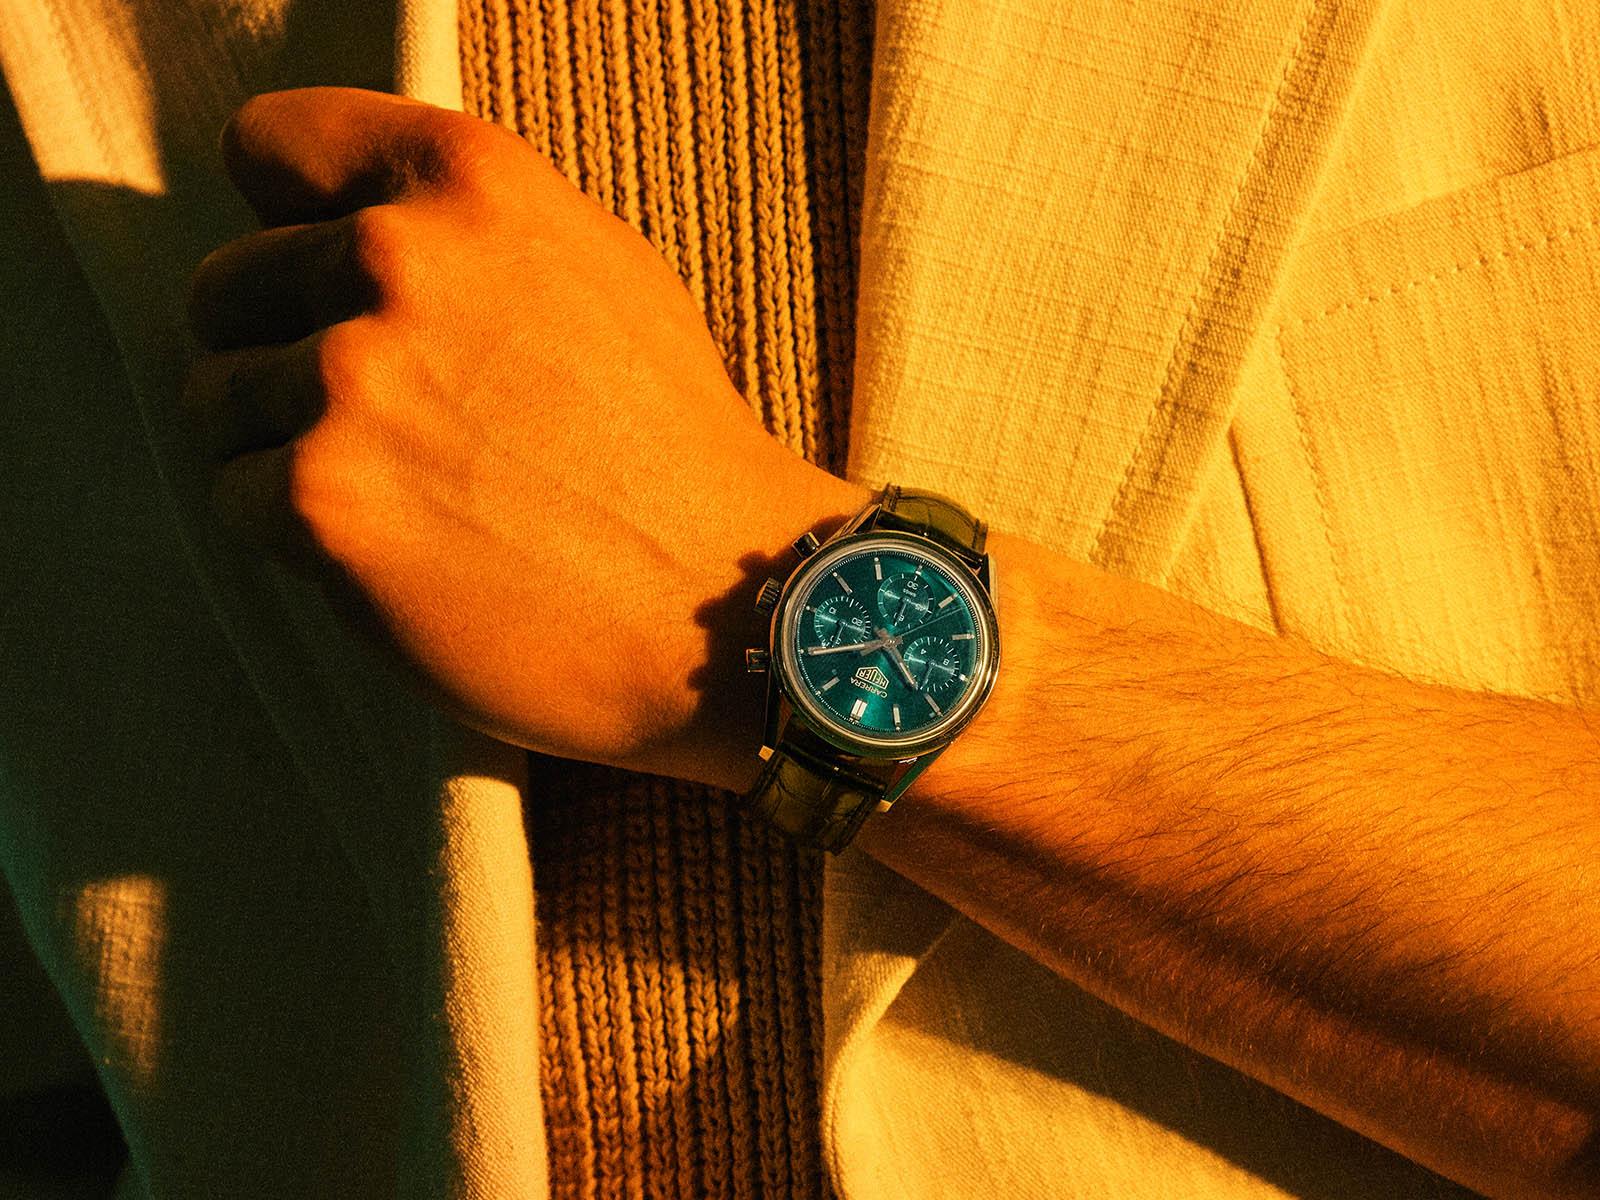 cbk221f-fc6479-tag-heuer-carrera-green-special-edition-9.jpg